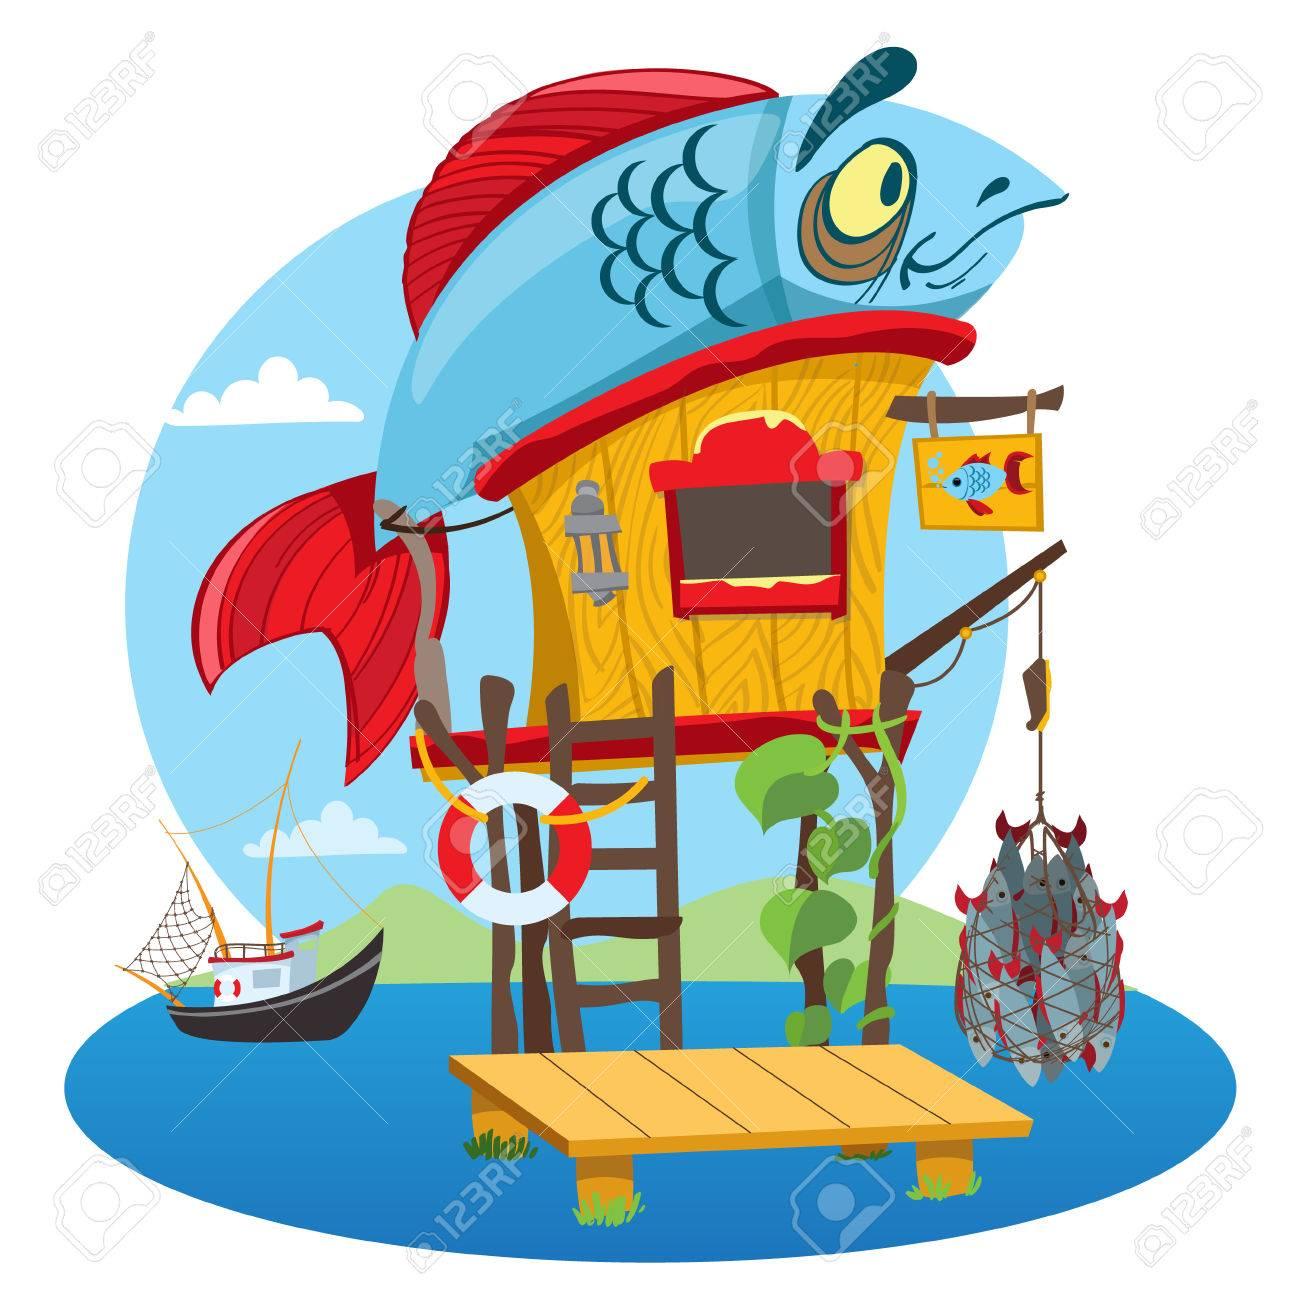 house fisherman cartoon illustration of a wooden hut on stiltshouse fisherman cartoon illustration of a wooden hut on stilts near the river drawing